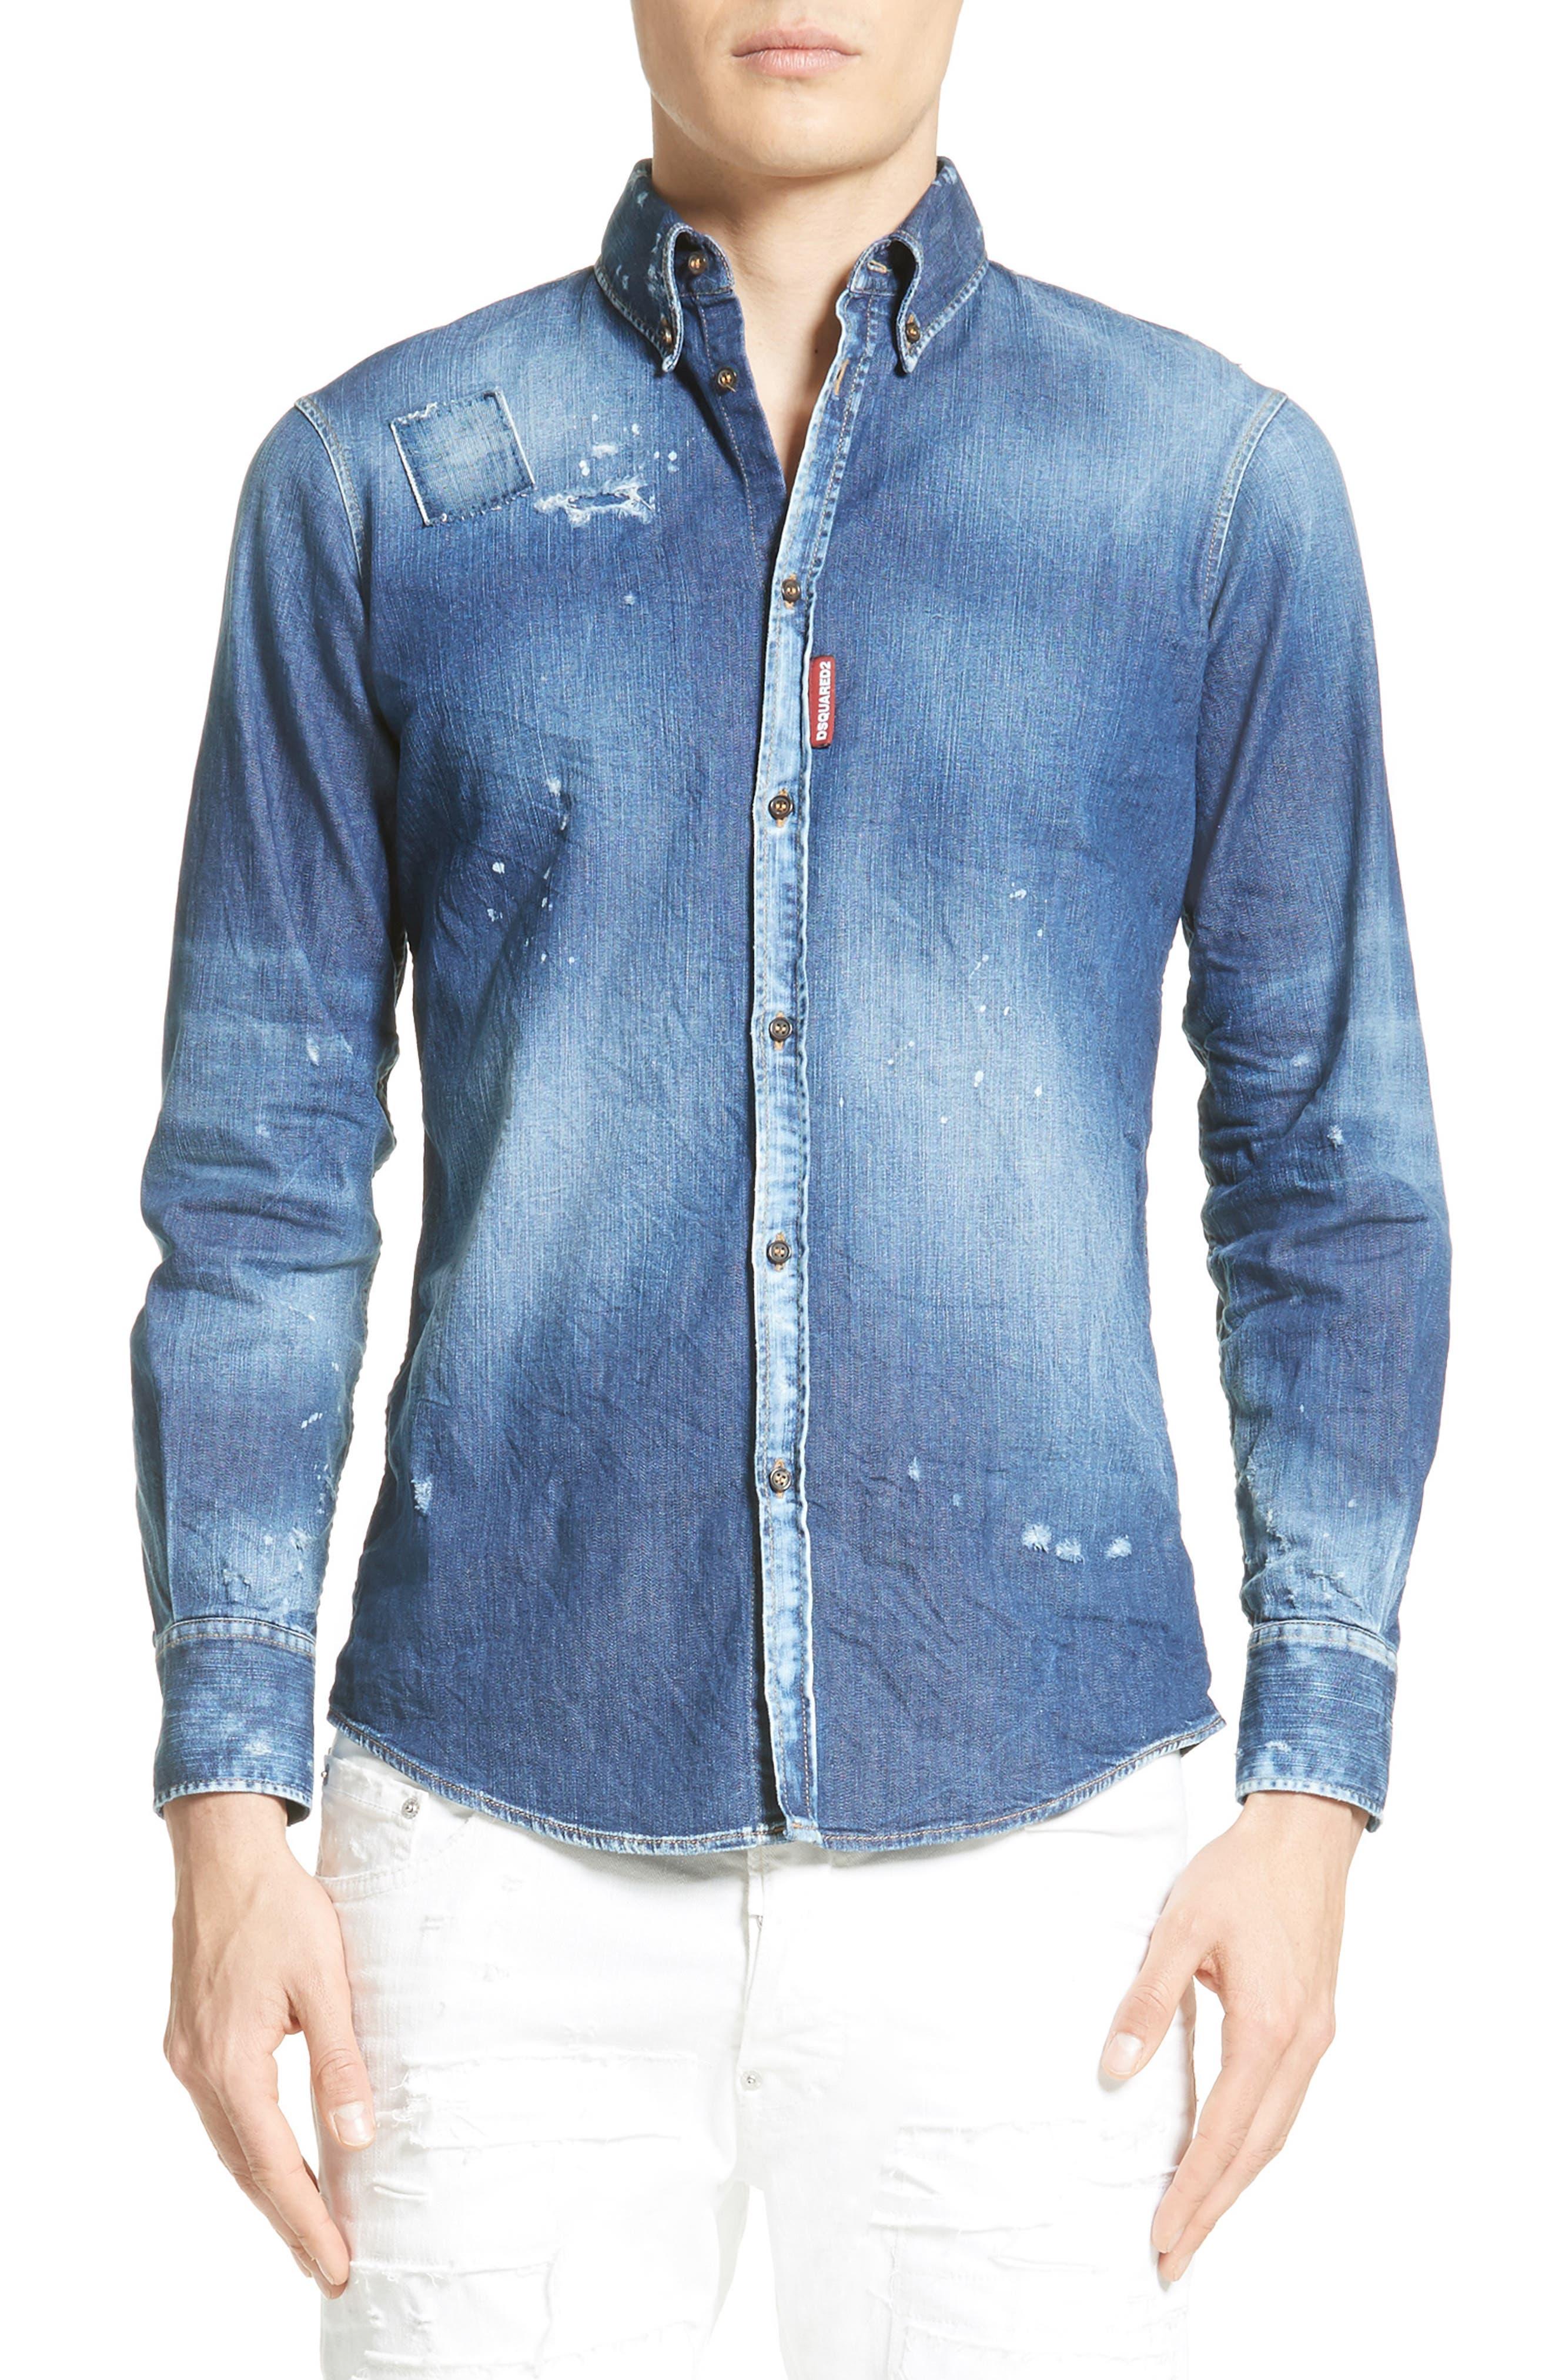 Alternate Image 1 Selected - Dsquared2 Extra Trim Fit Distressed Denim Sport Shirt